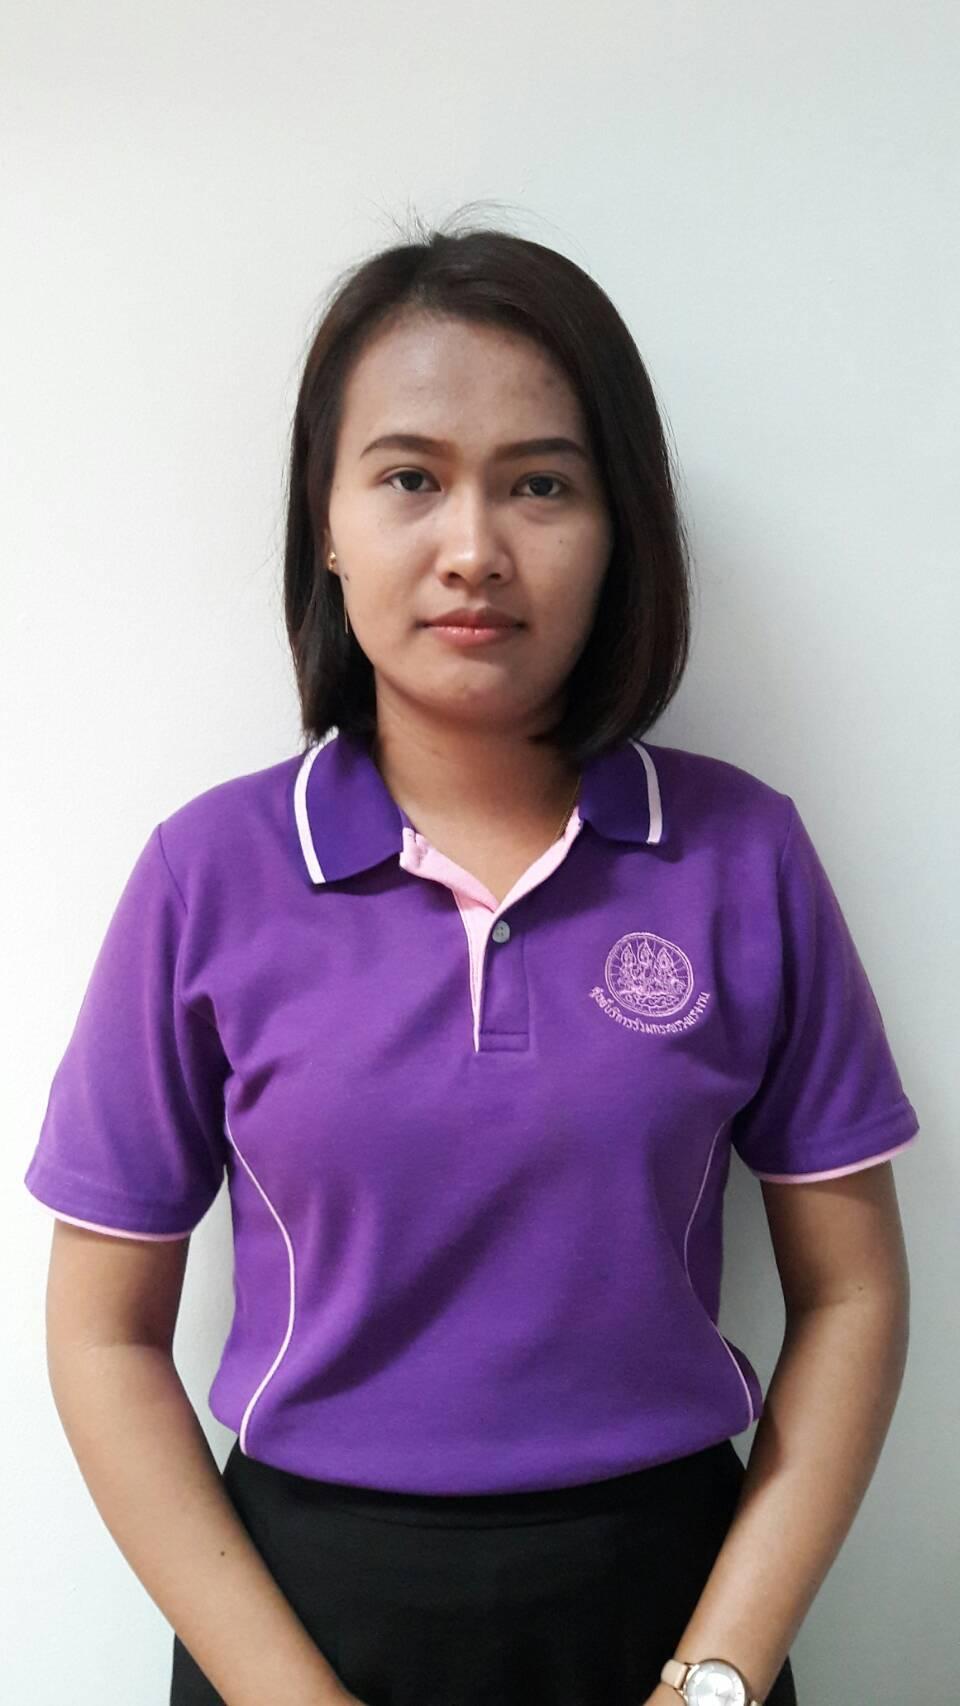 Miss Sunanta Prasutthong